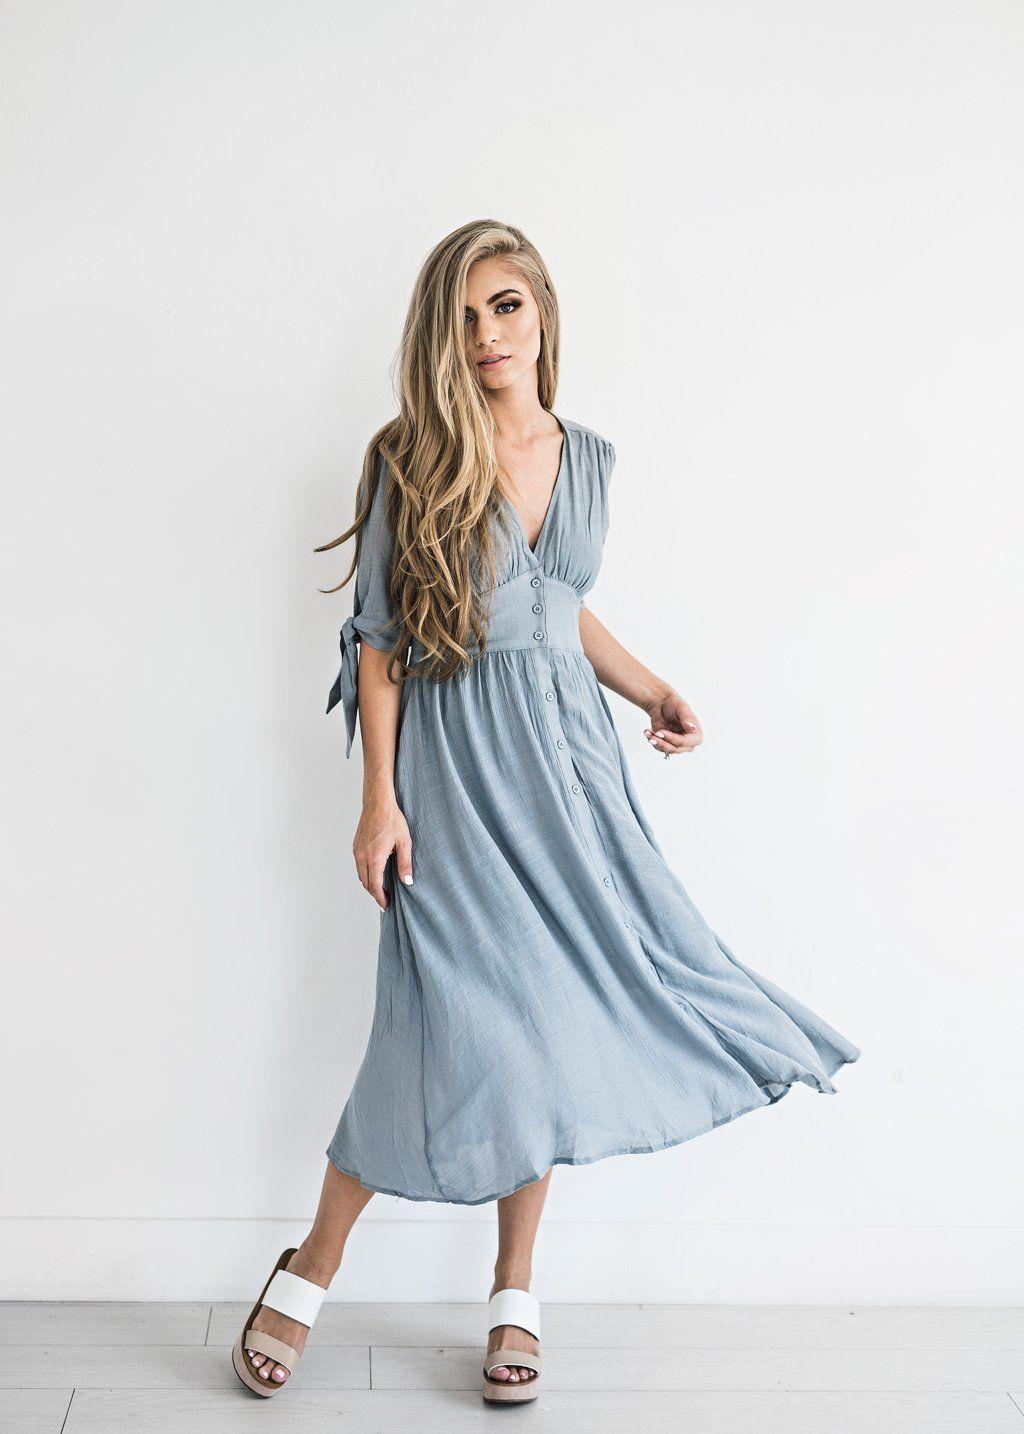 ea55f1936a1 Lucerne Wind Button-Down Dress